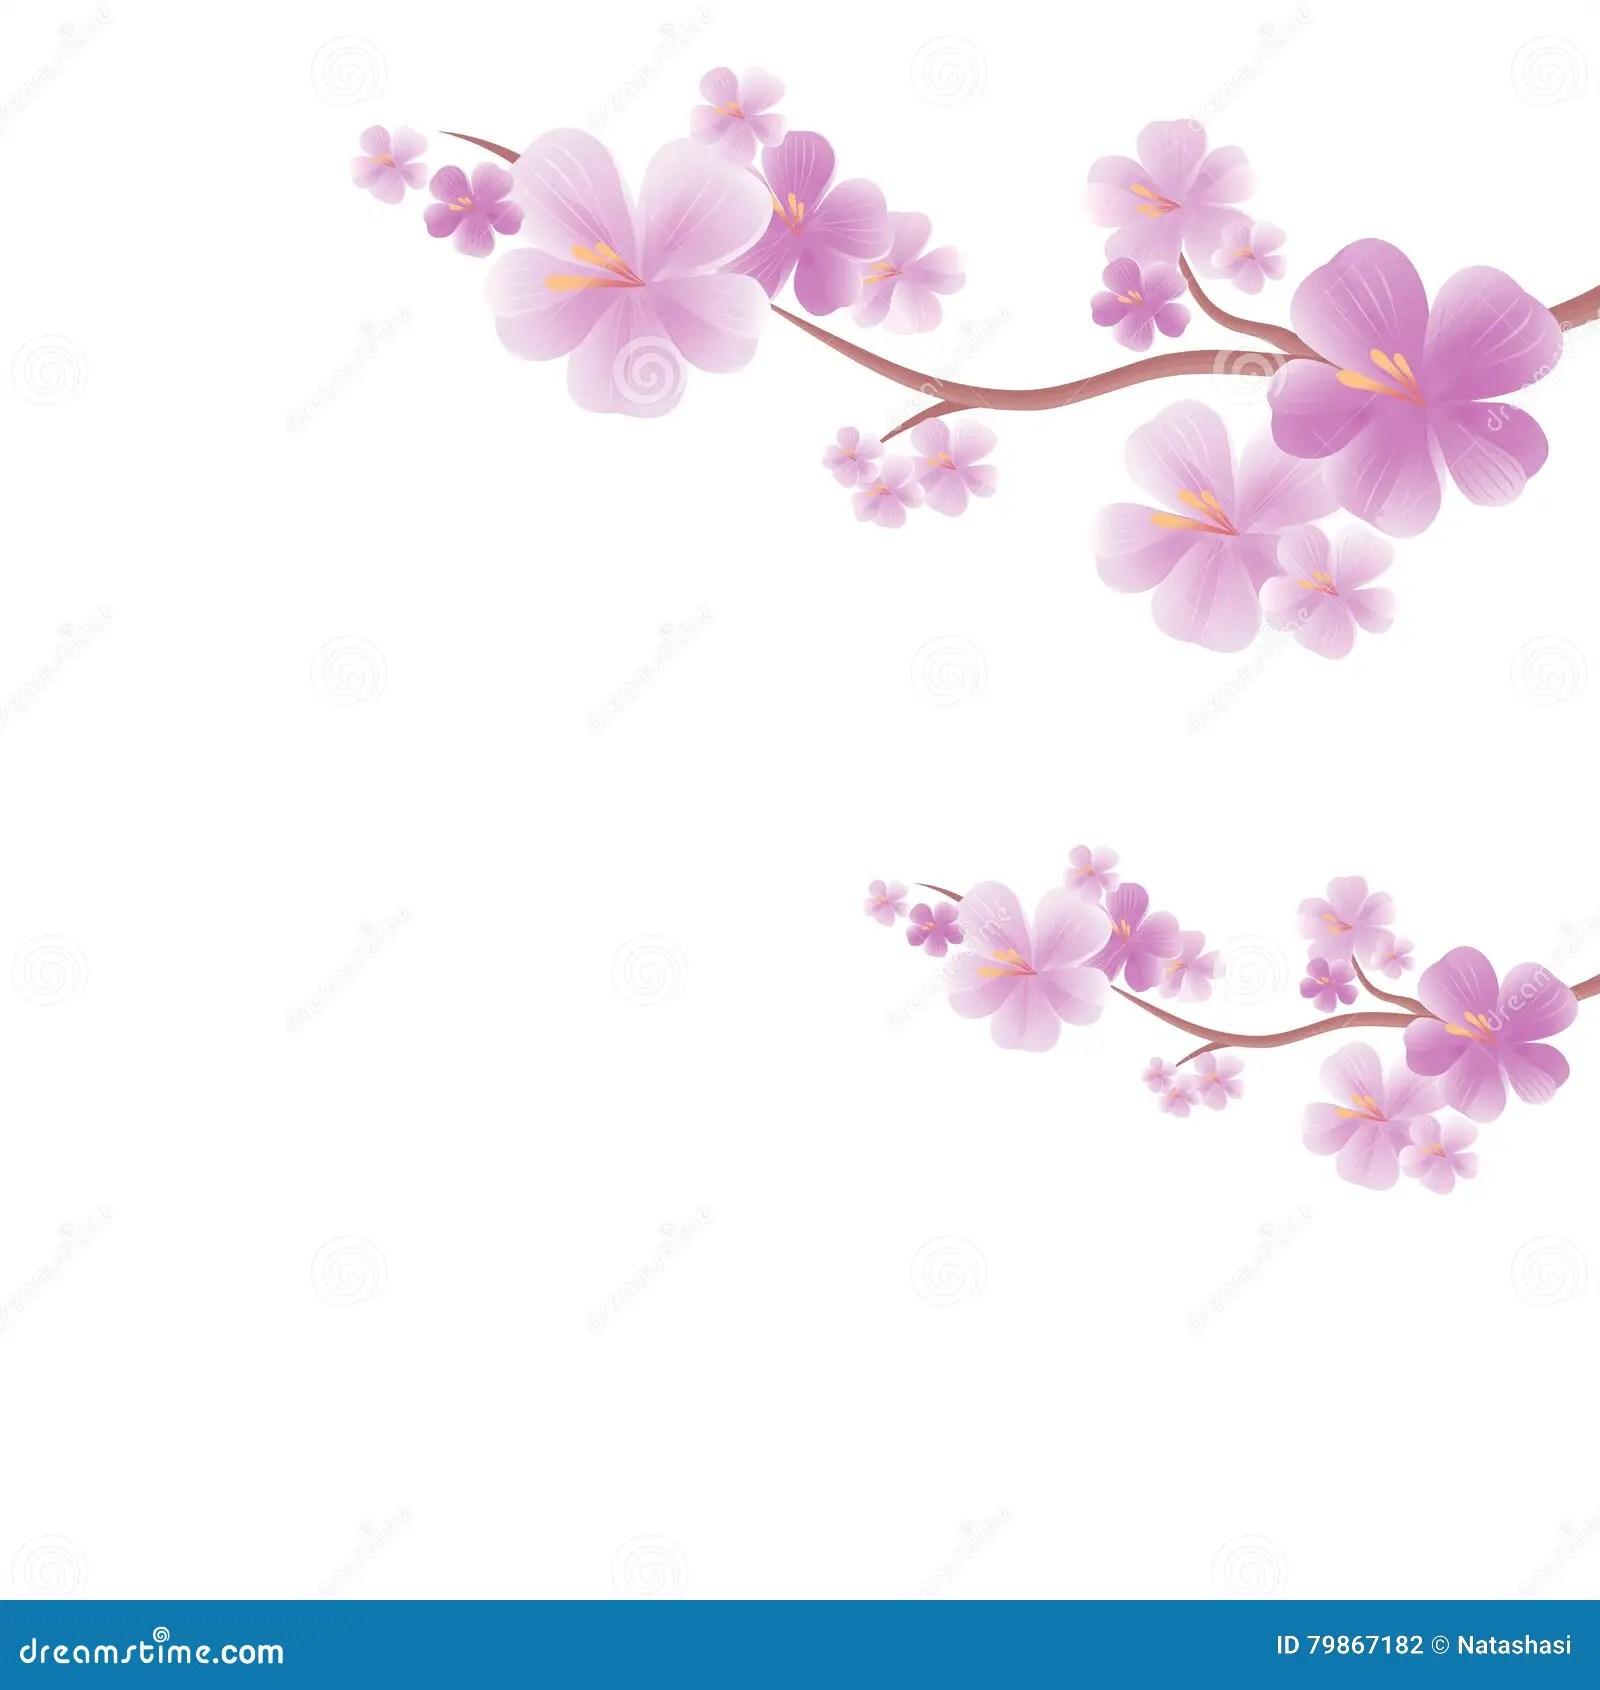 Falling Cherry Blossoms Wallpaper Dise 241 O De Las Flores Las Ramas De Sakura Aislaron En El